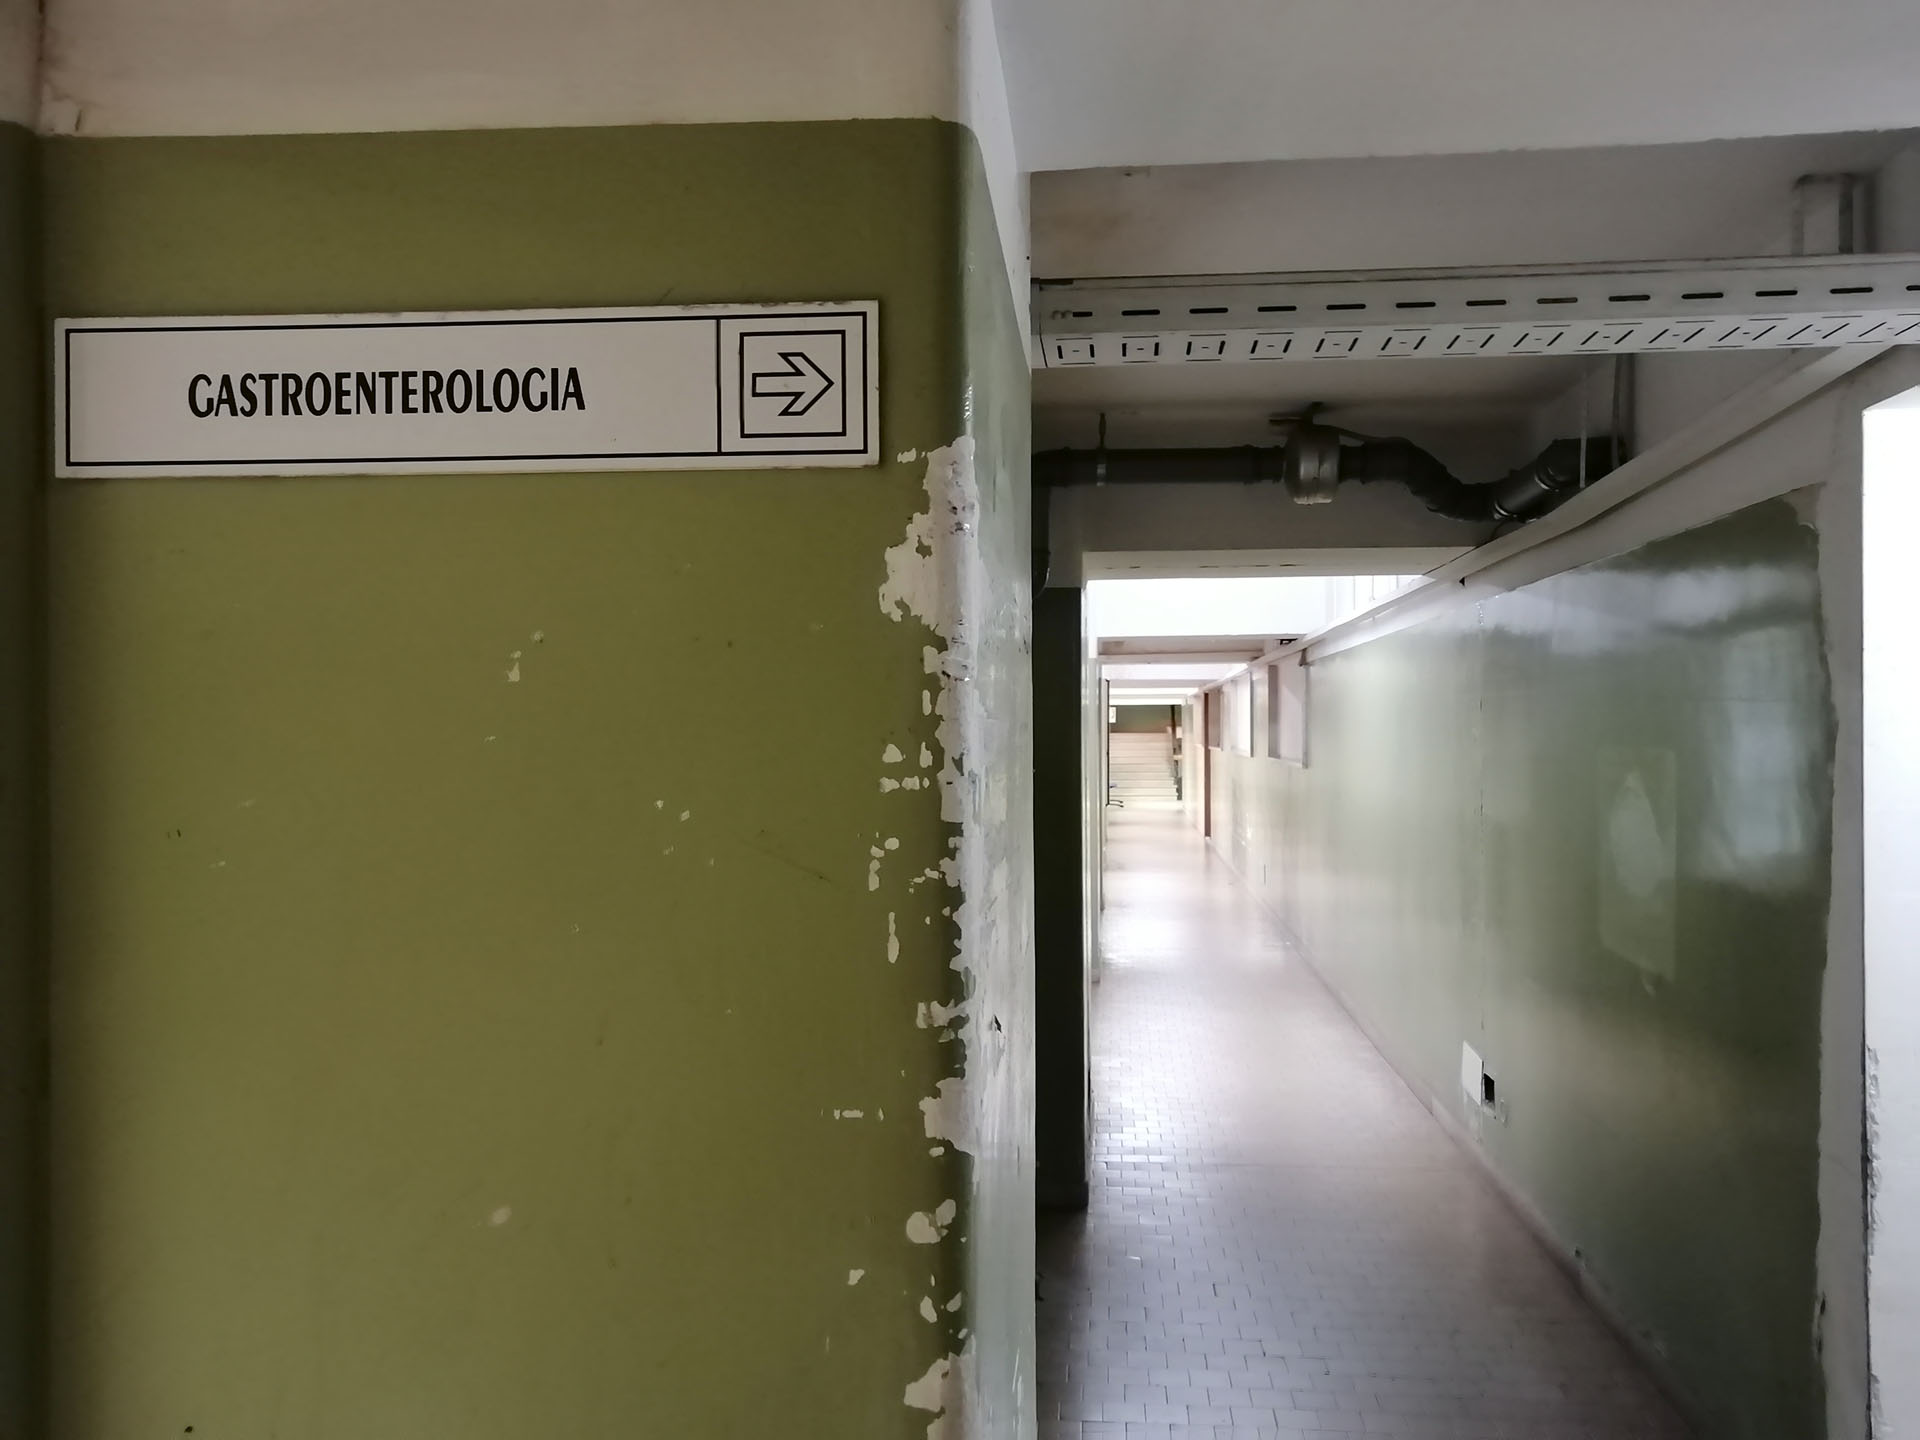 Ospedale Horror? Conia reagisce: Decreto Calabria intangibile